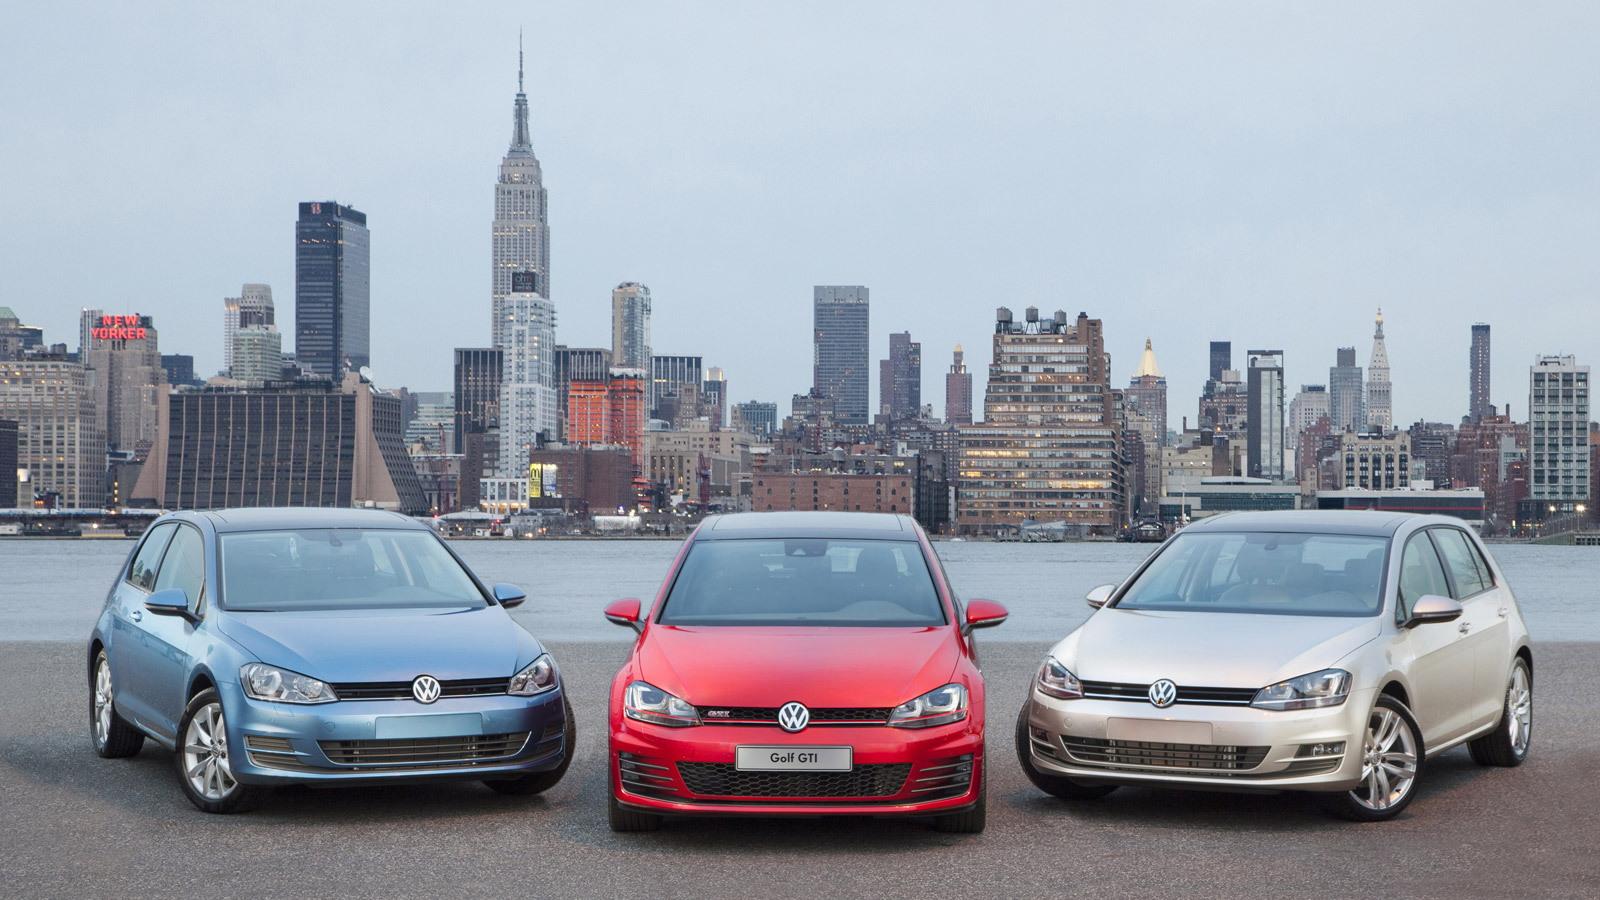 Vw Of America >> Volkswagen Debuts 2015 Gti And Golf In New York